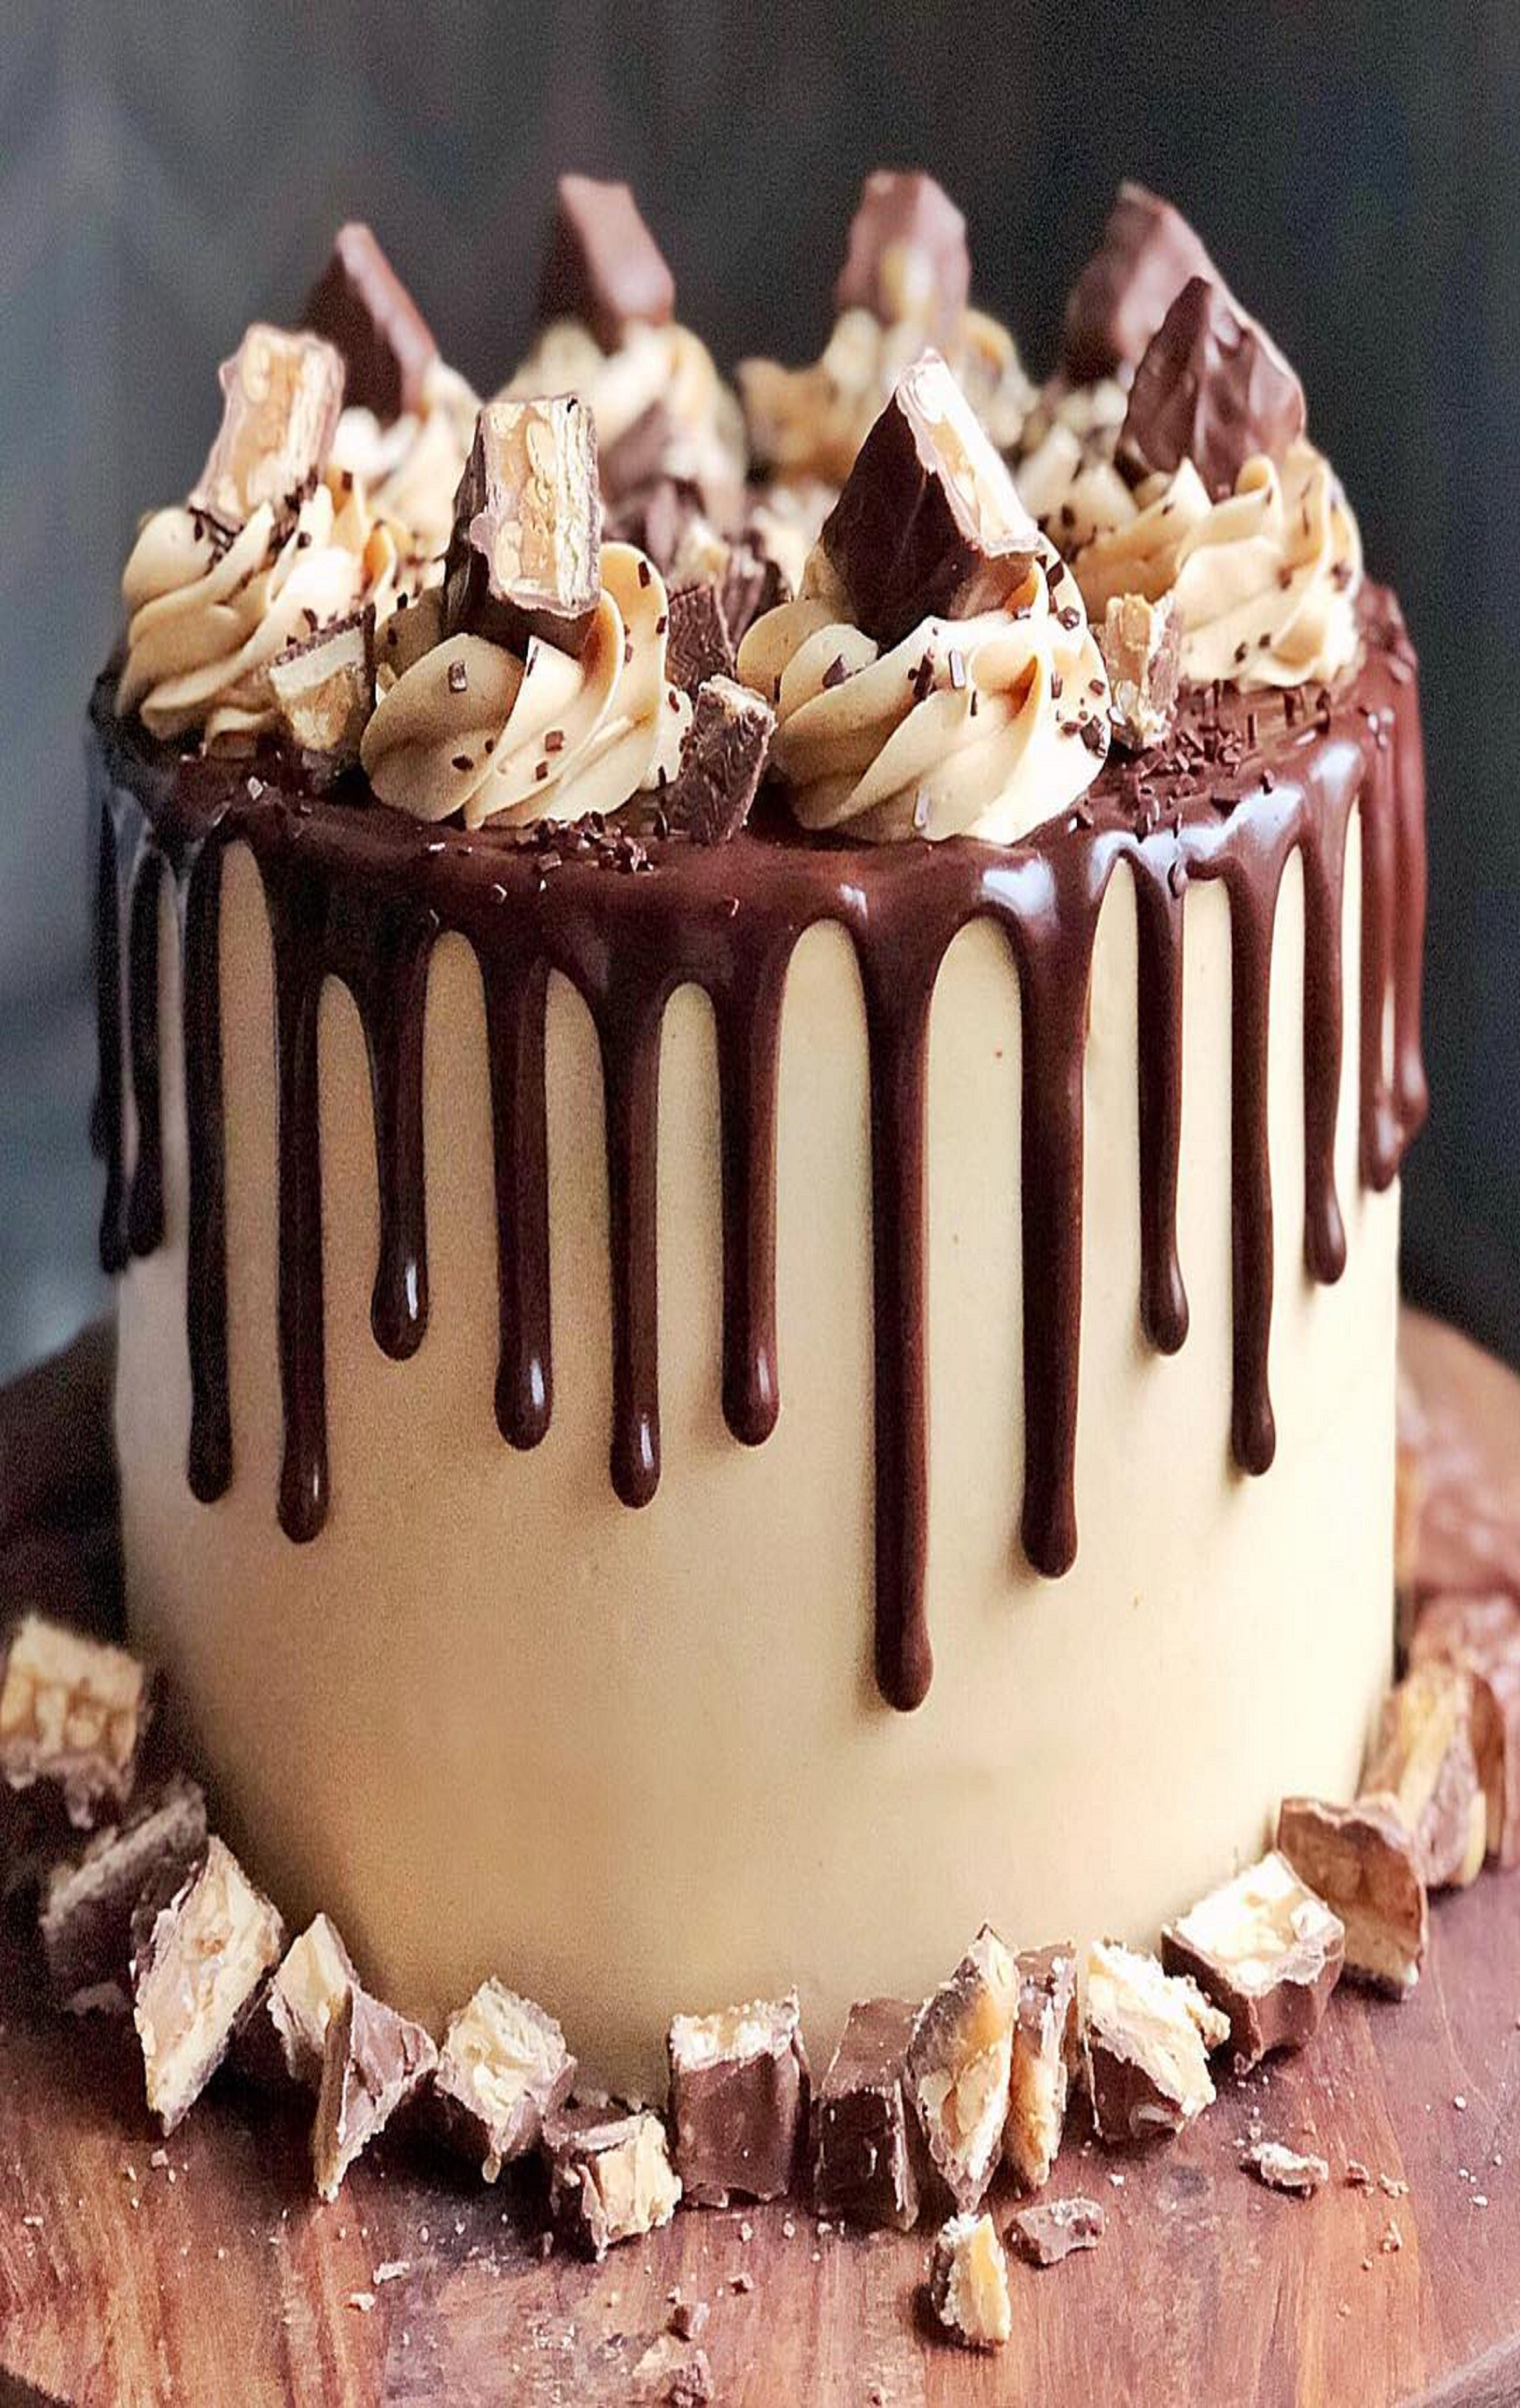 Stupendous Pin By Ivanka Kostova On Khrana Candy Bar Cake Snickers Cake Funny Birthday Cards Online Hetedamsfinfo